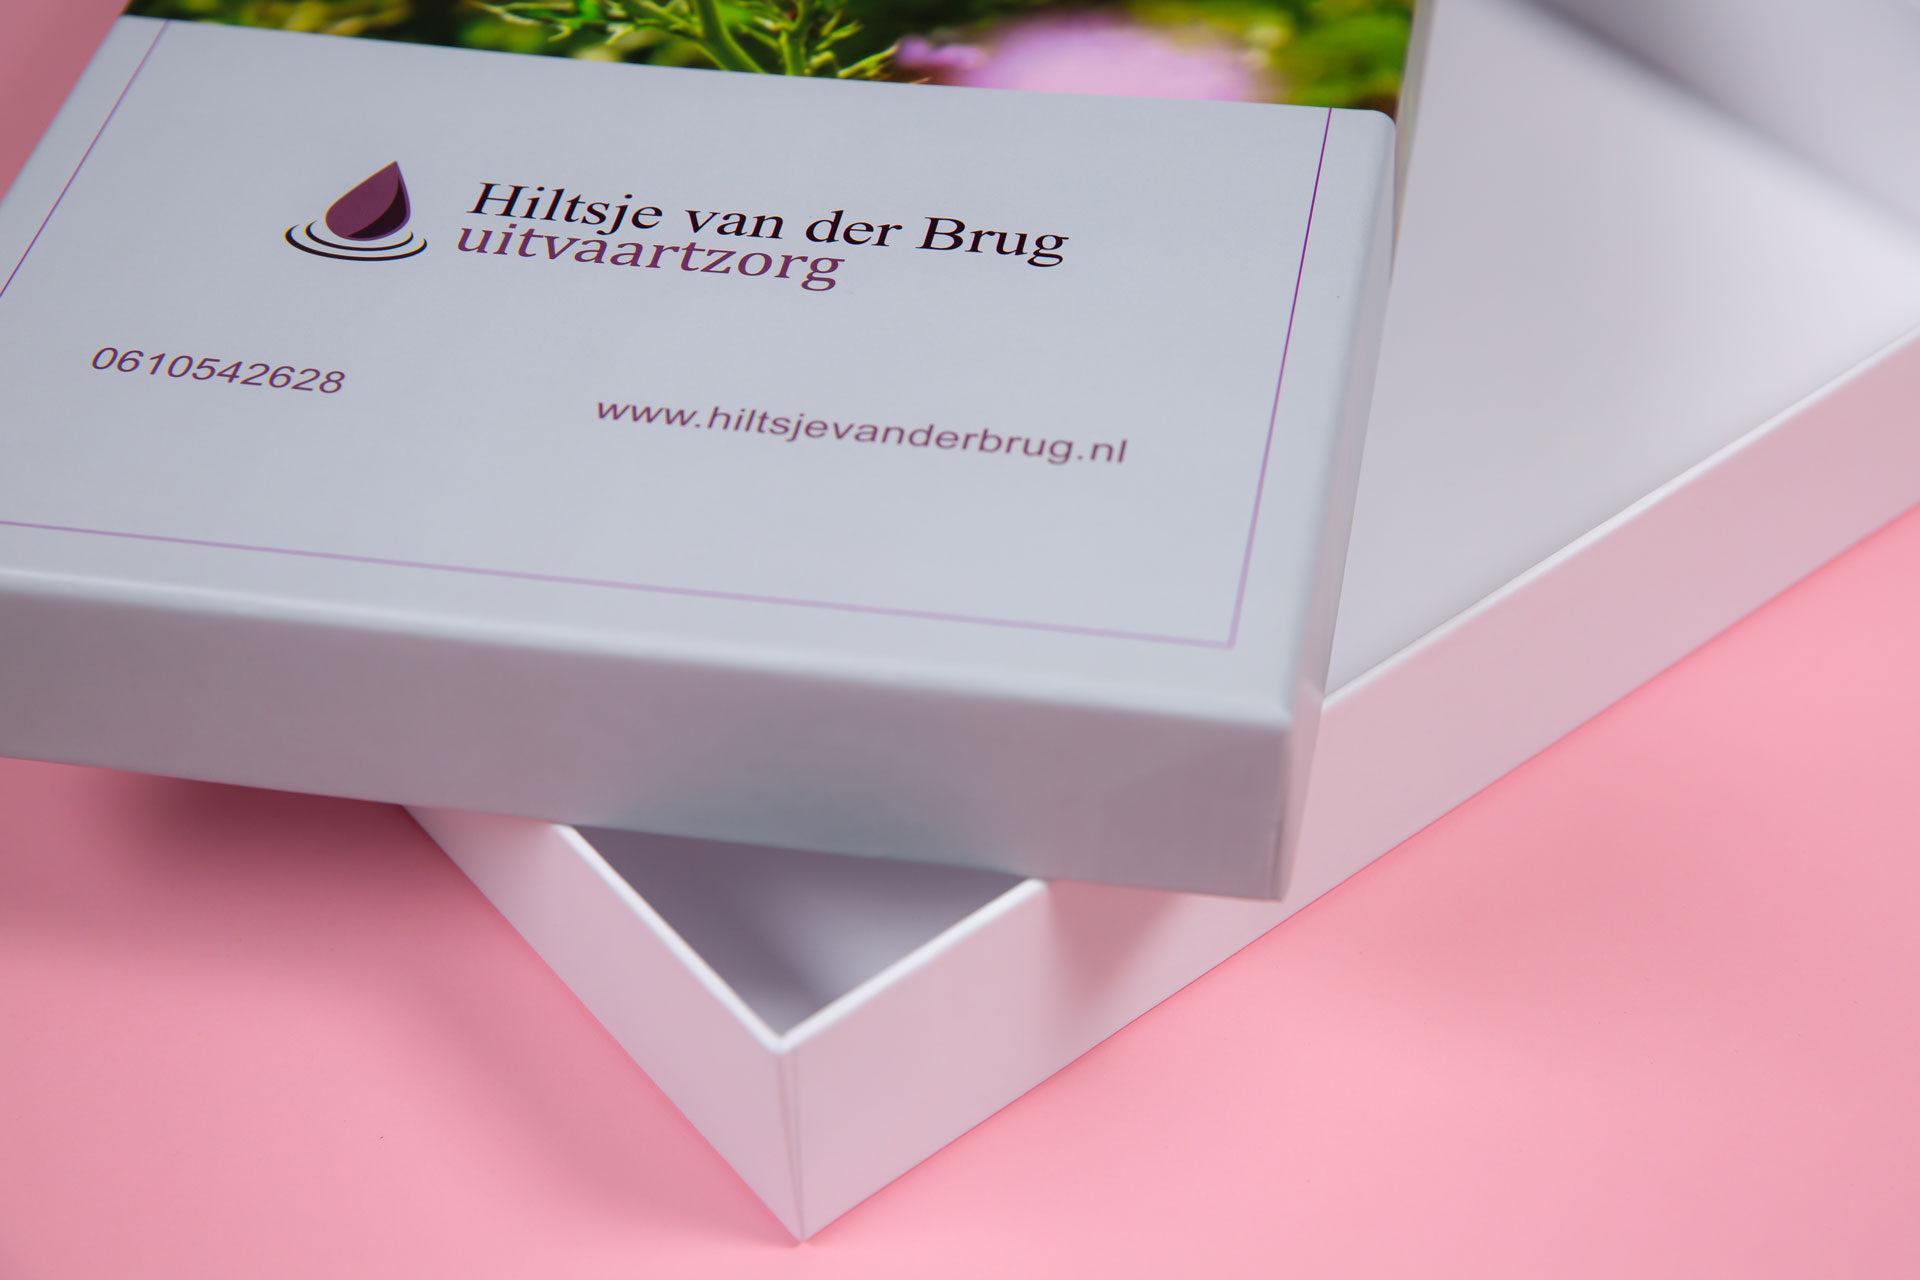 A4 doos met deksel Hiltsje van der Brug